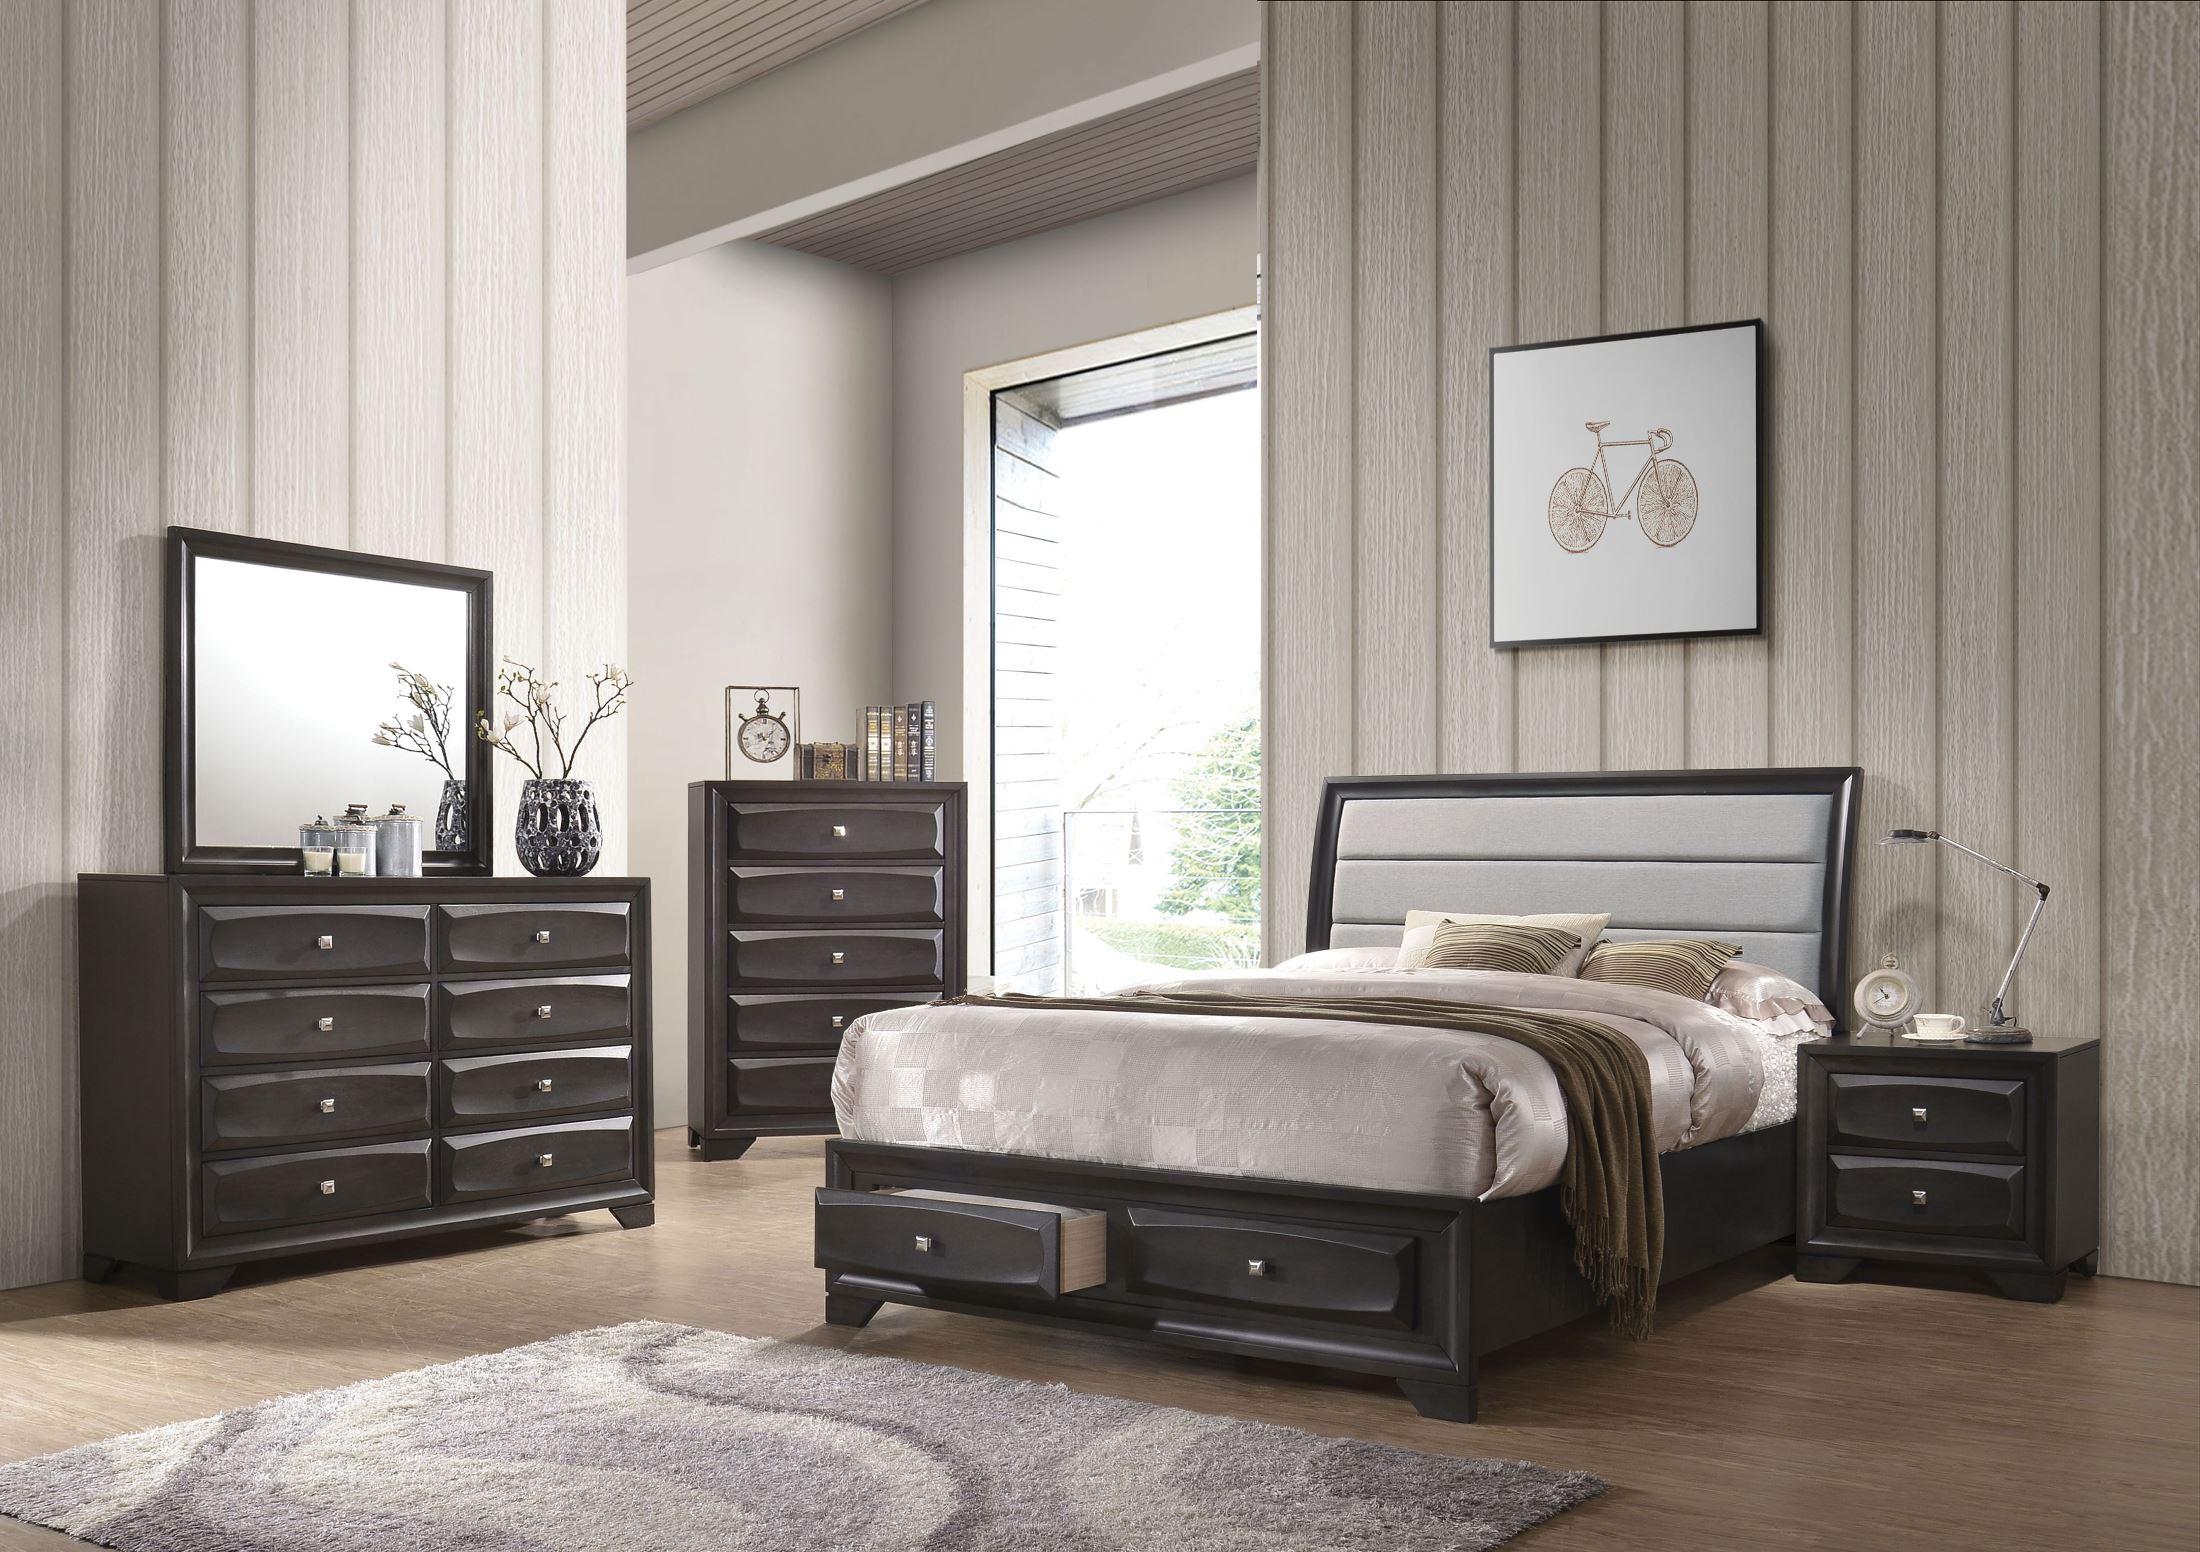 Grey Vintage Bedroom: ACME Soteris Antique Gray Sleigh Storage Bedroom Set